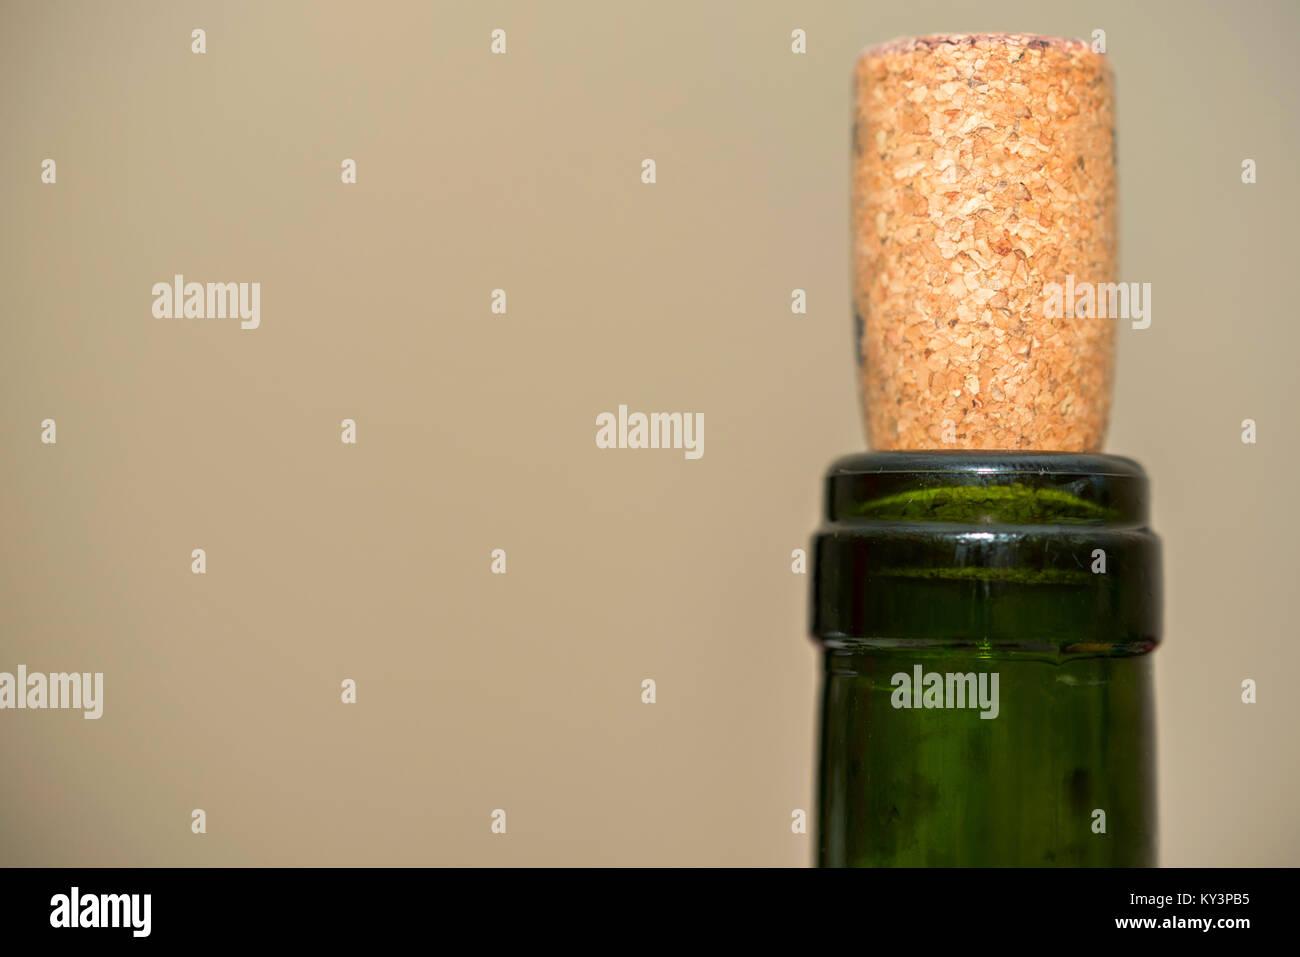 Bottleneck and cork close - Stock Image